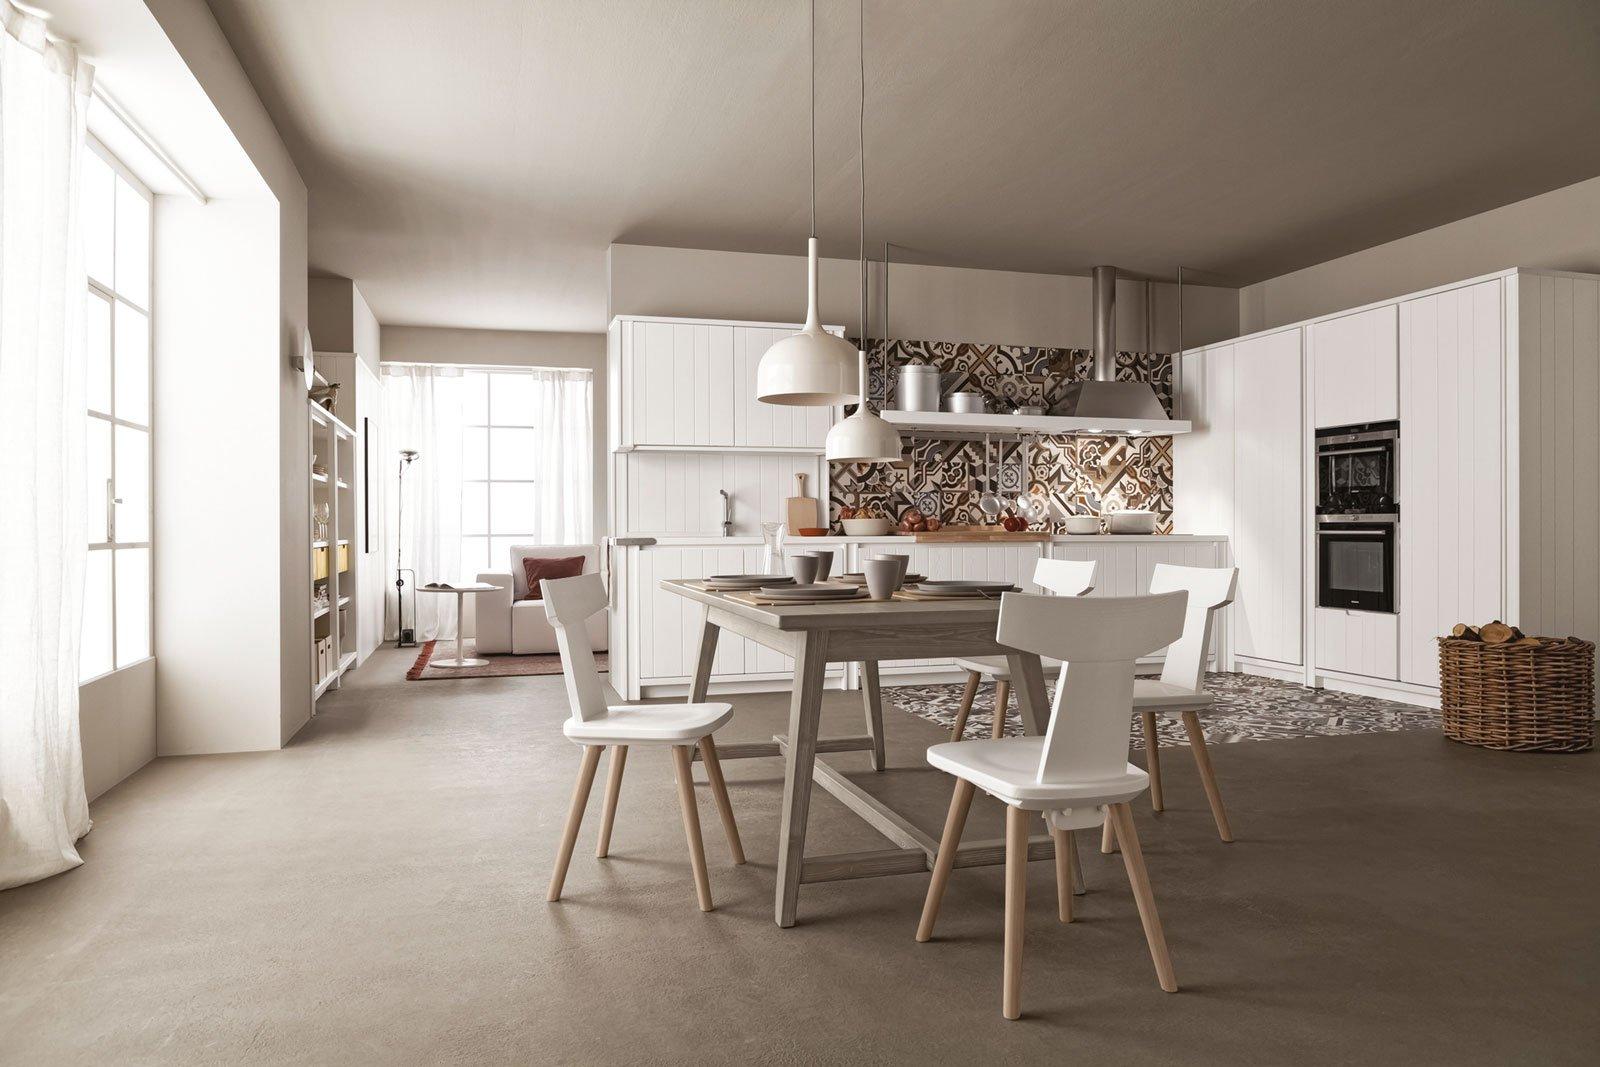 Cucina bianca il fascino eterno della luminosit cose - Cucina tortora e bianca ...